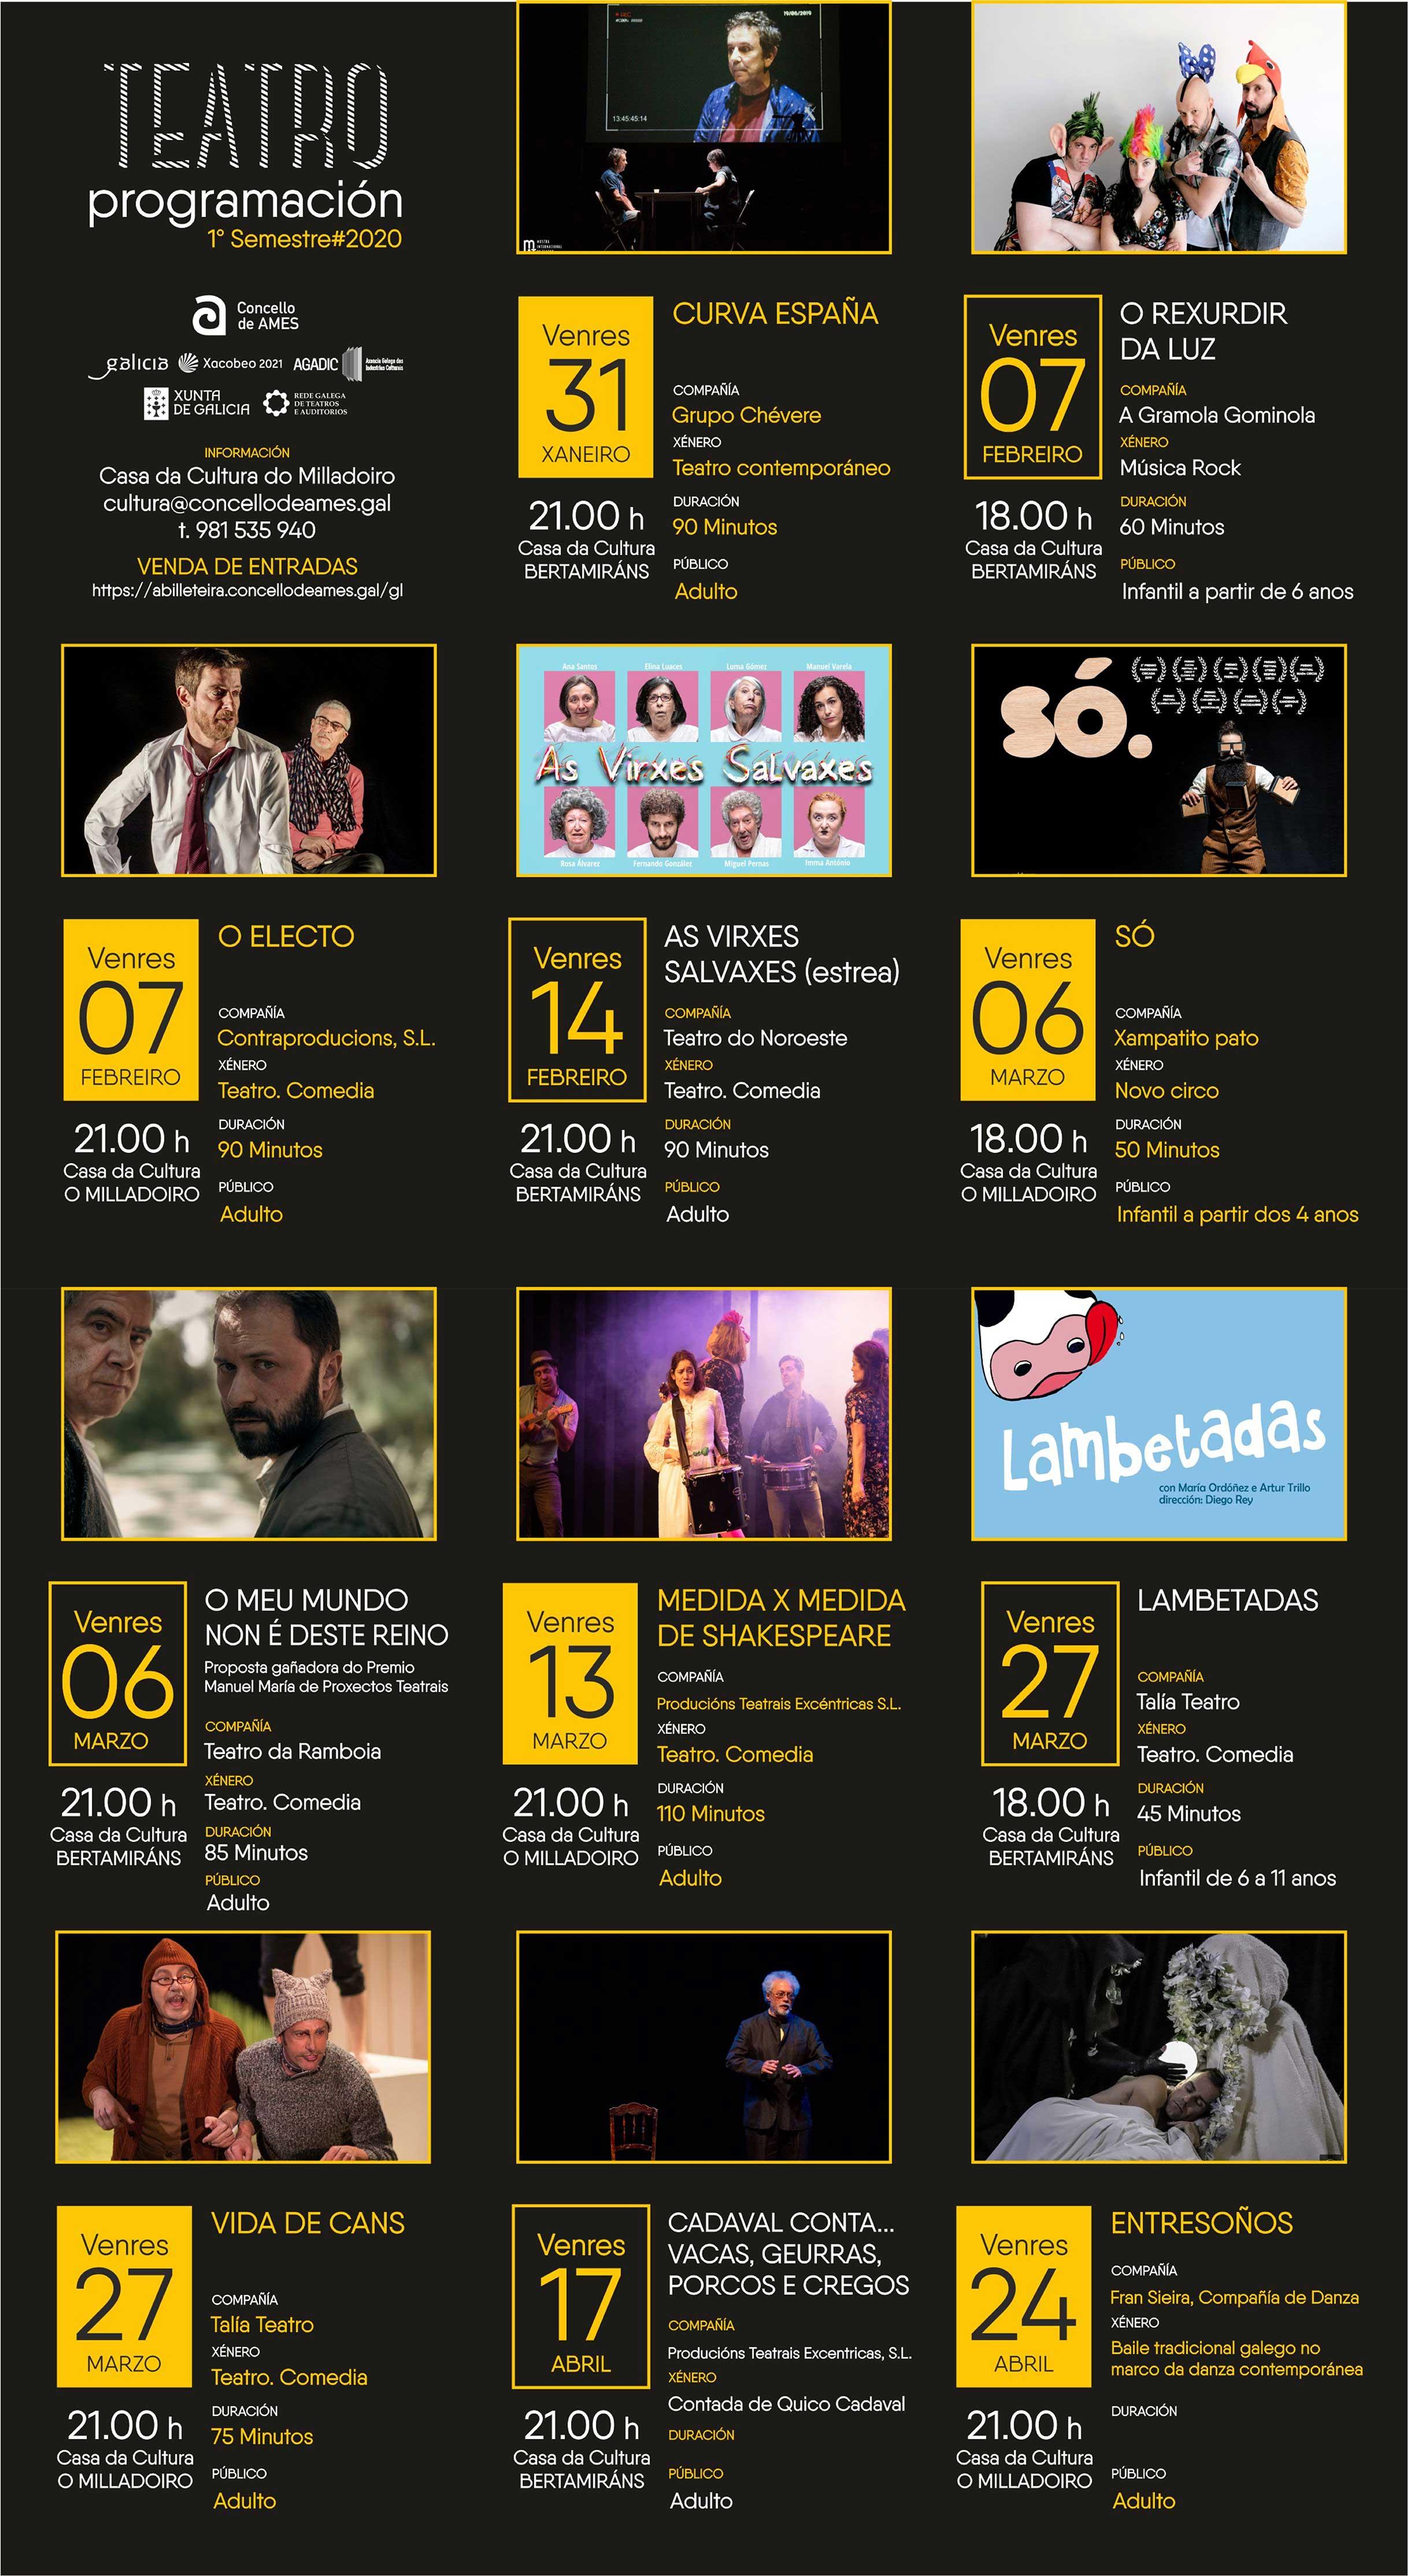 Programa de teatro en Ames 1º semestre 2020